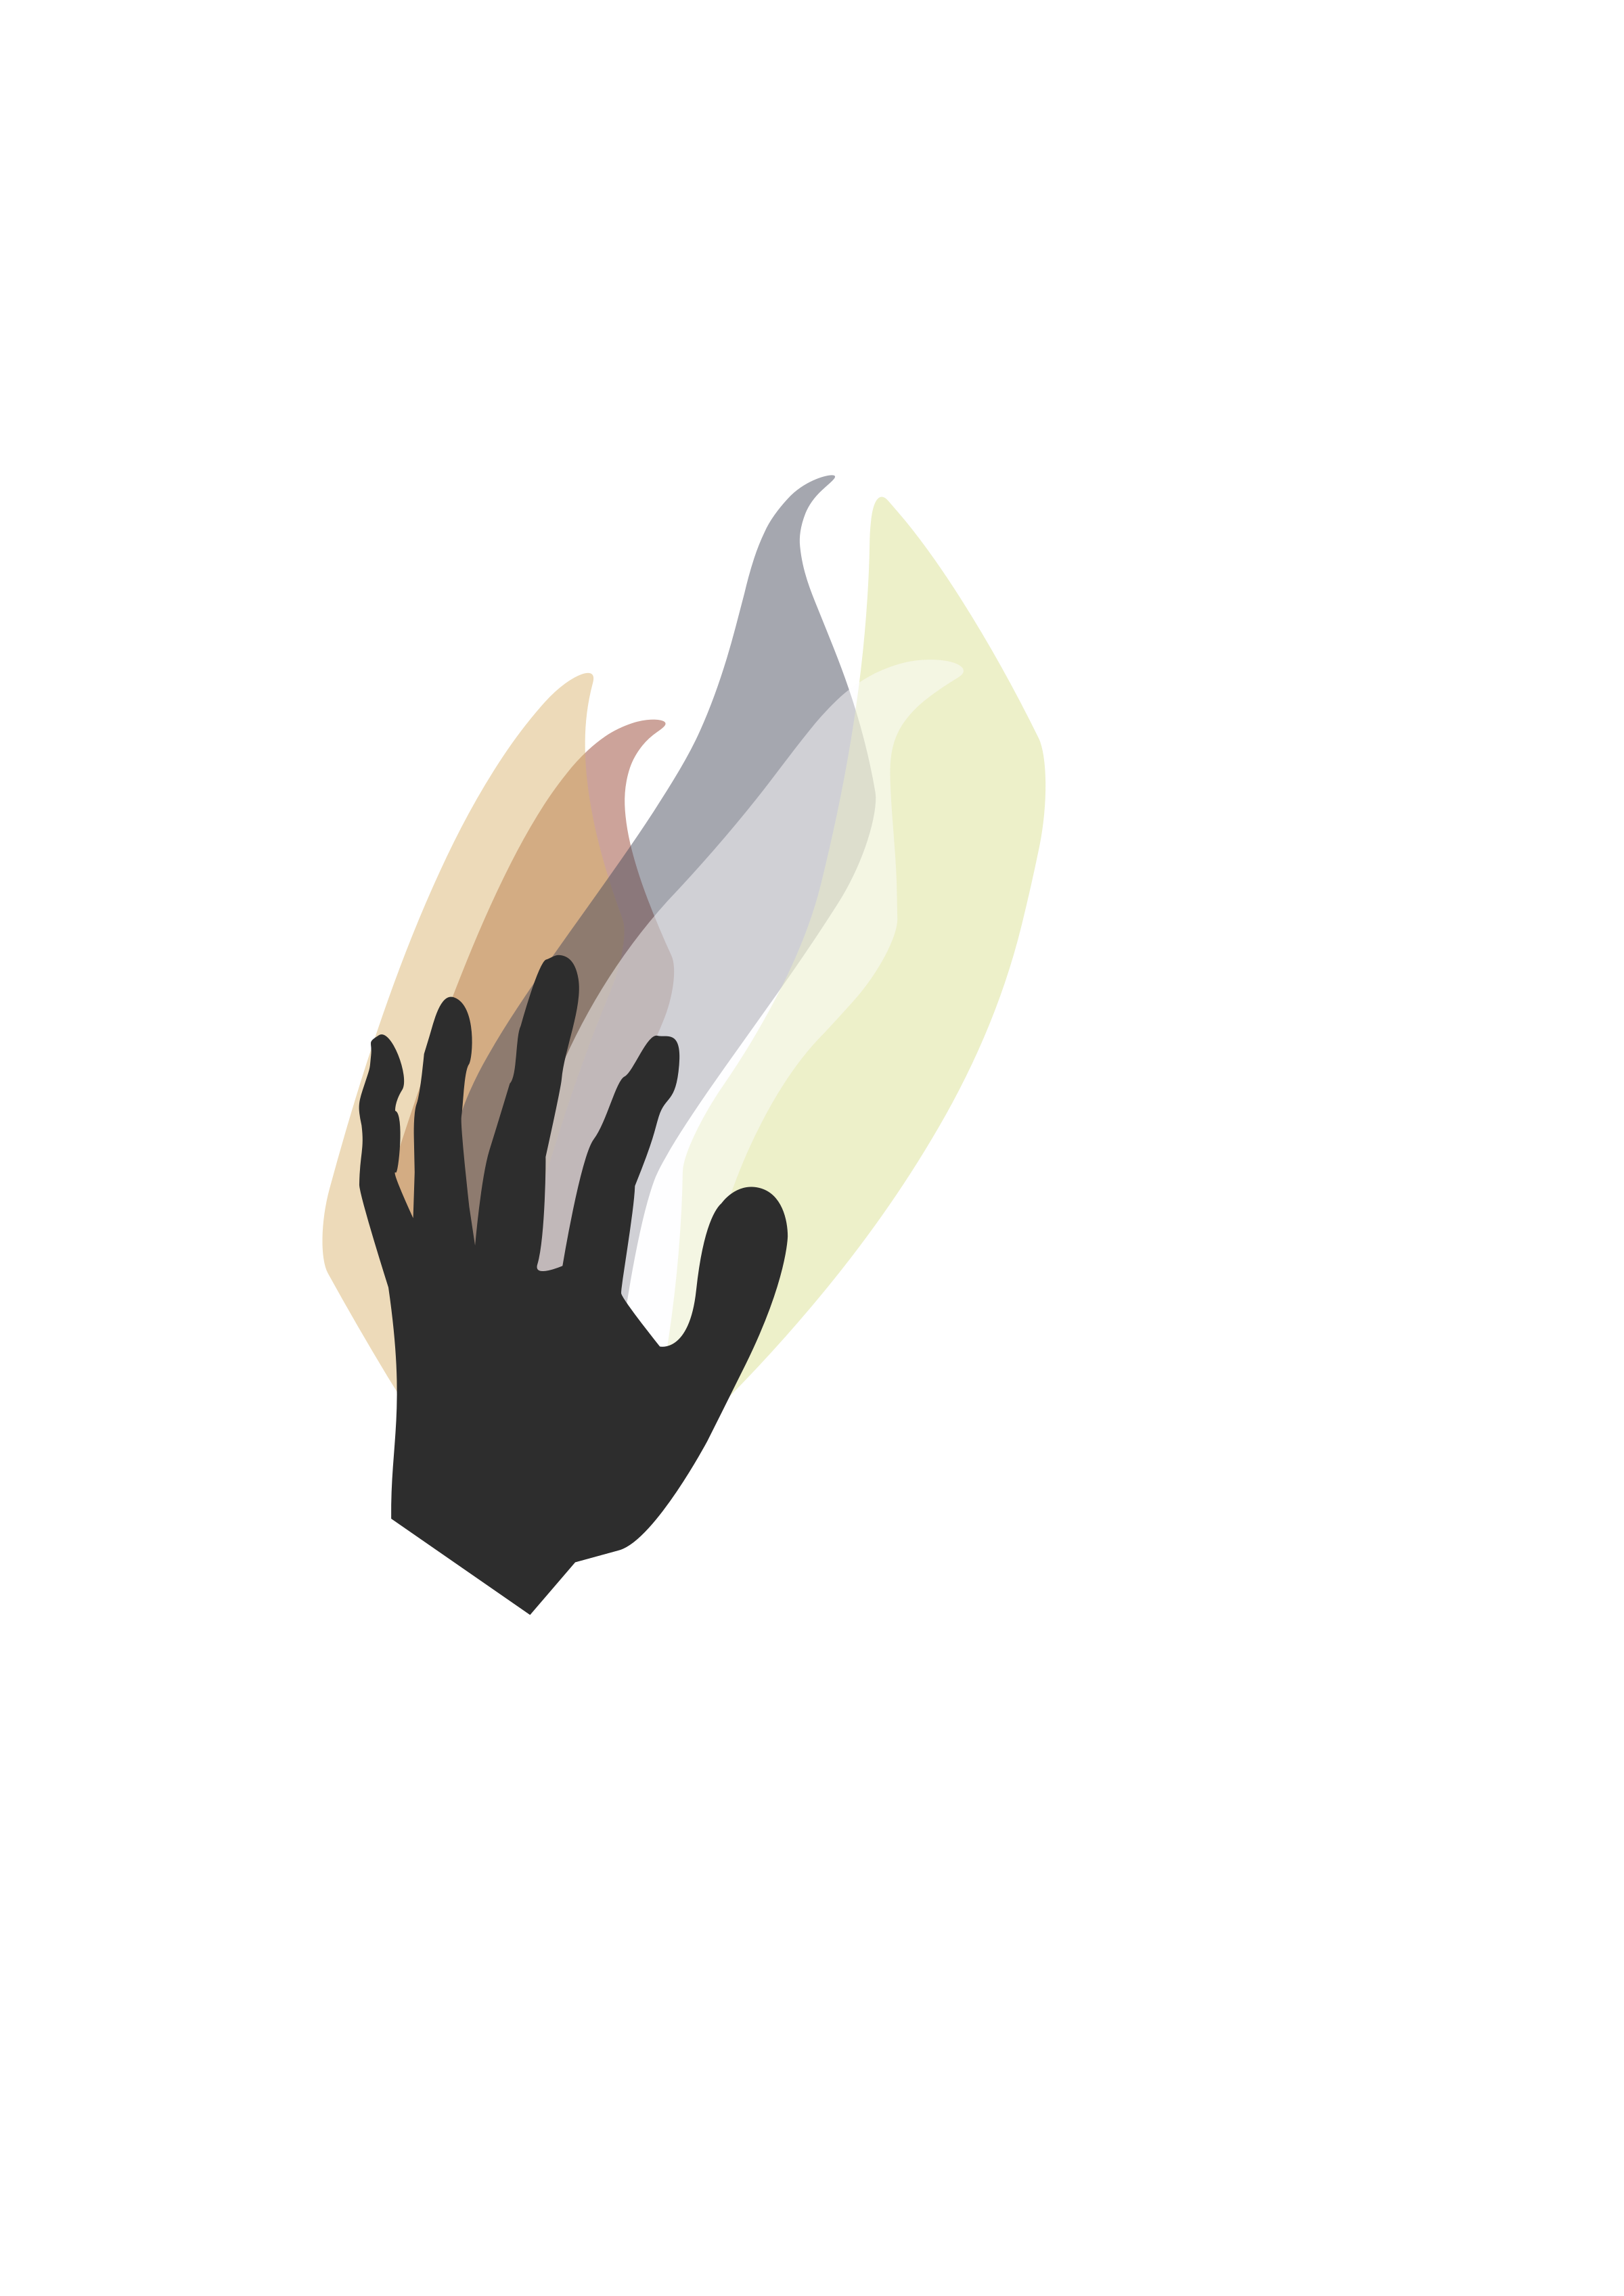 Clipart - hand logo